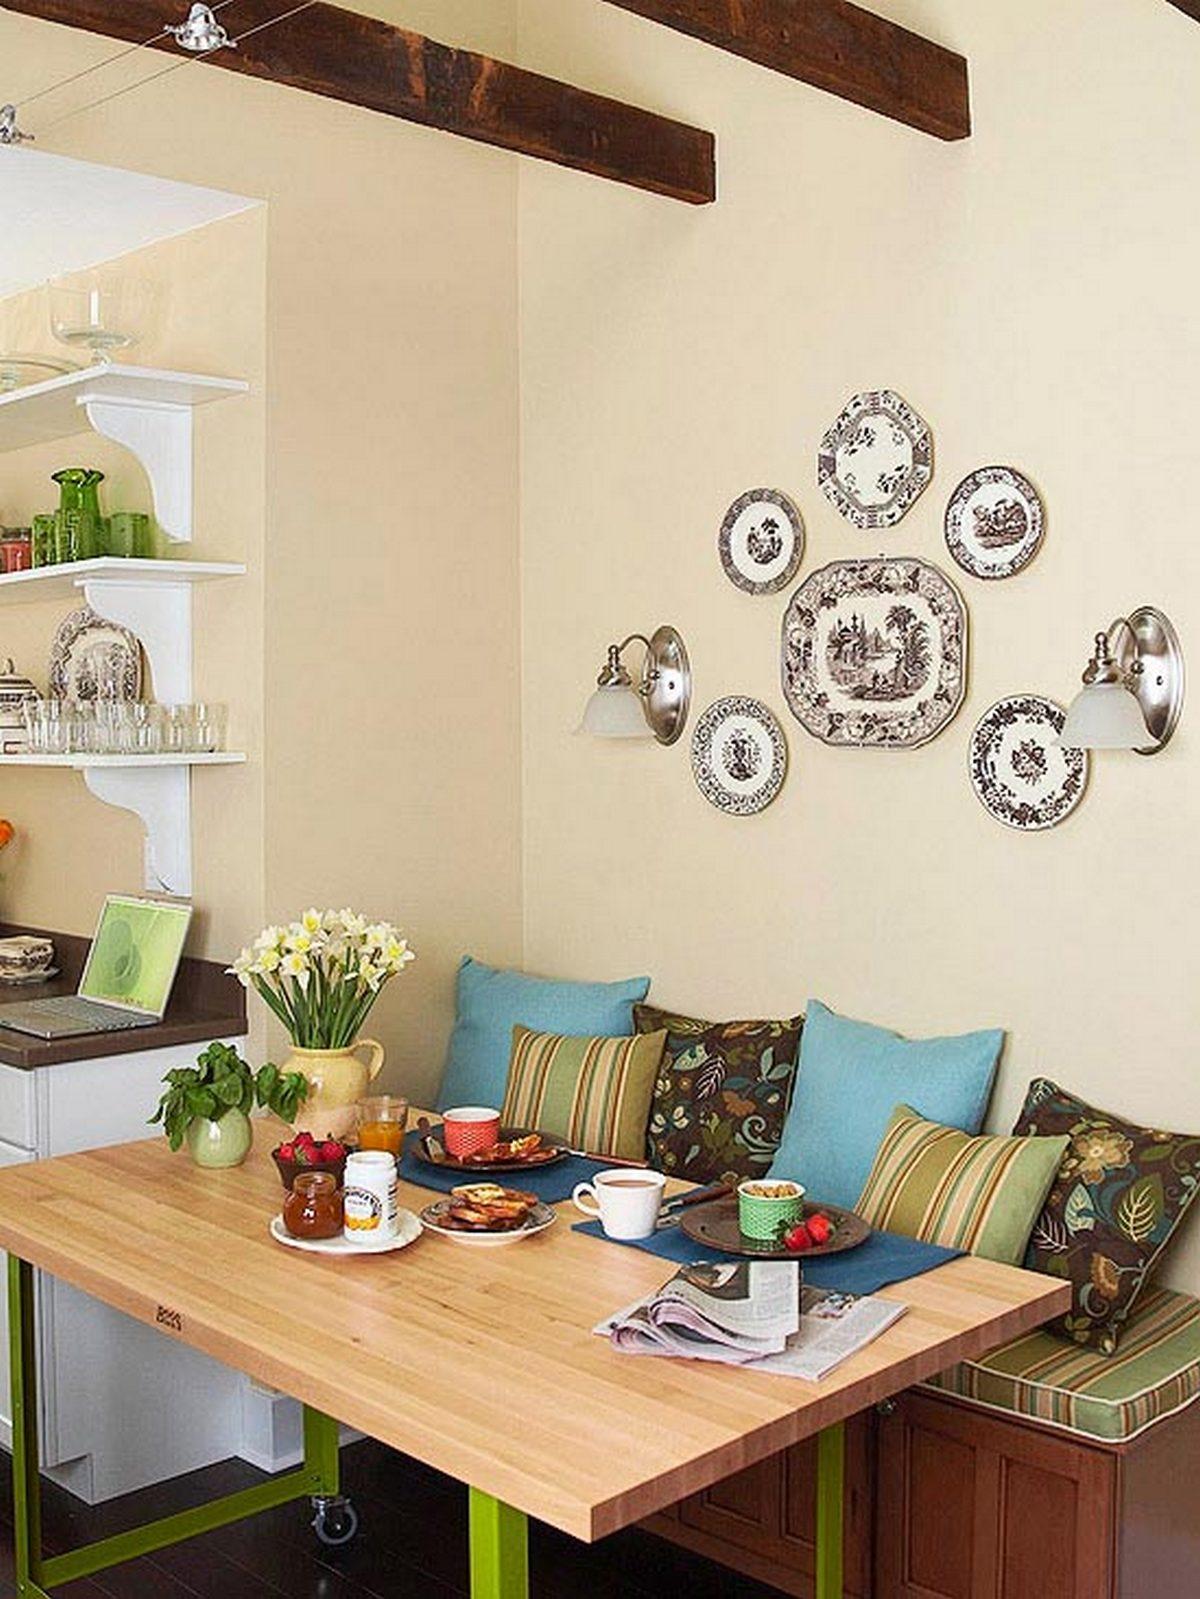 симметричная компоновка тарелок декор кухни